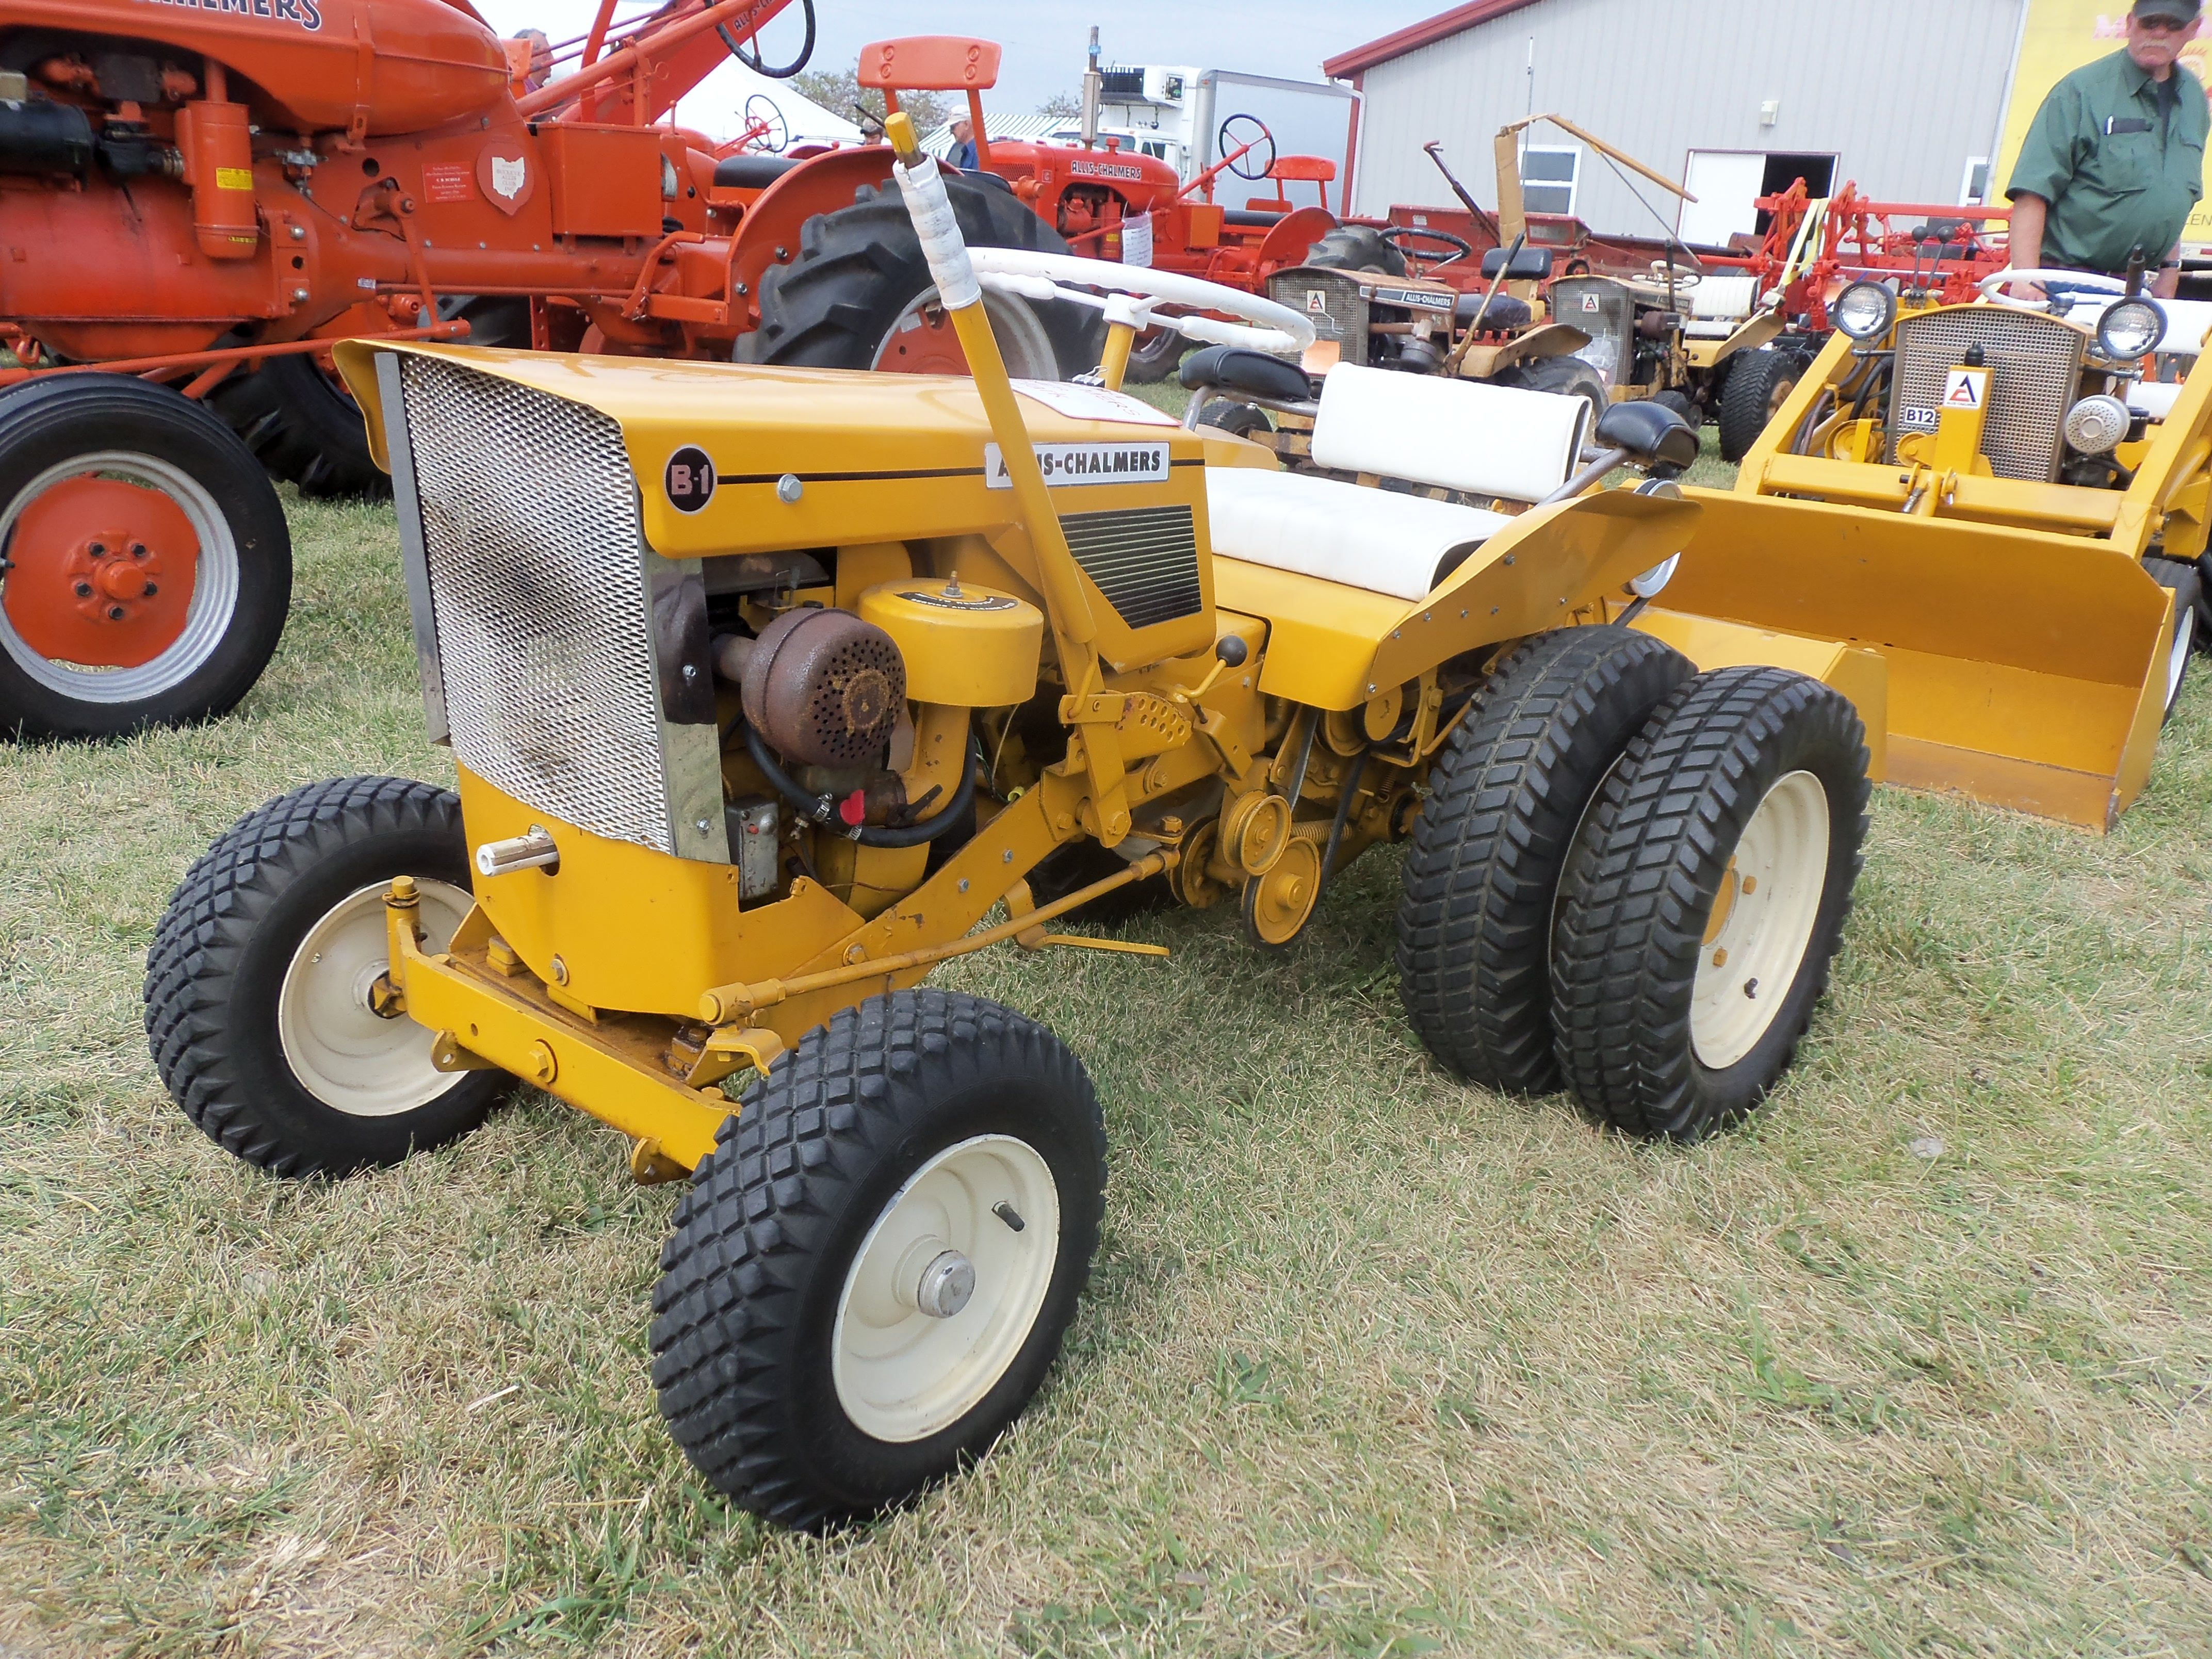 Allis Chalmers Garden Tractors : Allis chalmers b lawn garden tractor places to visit